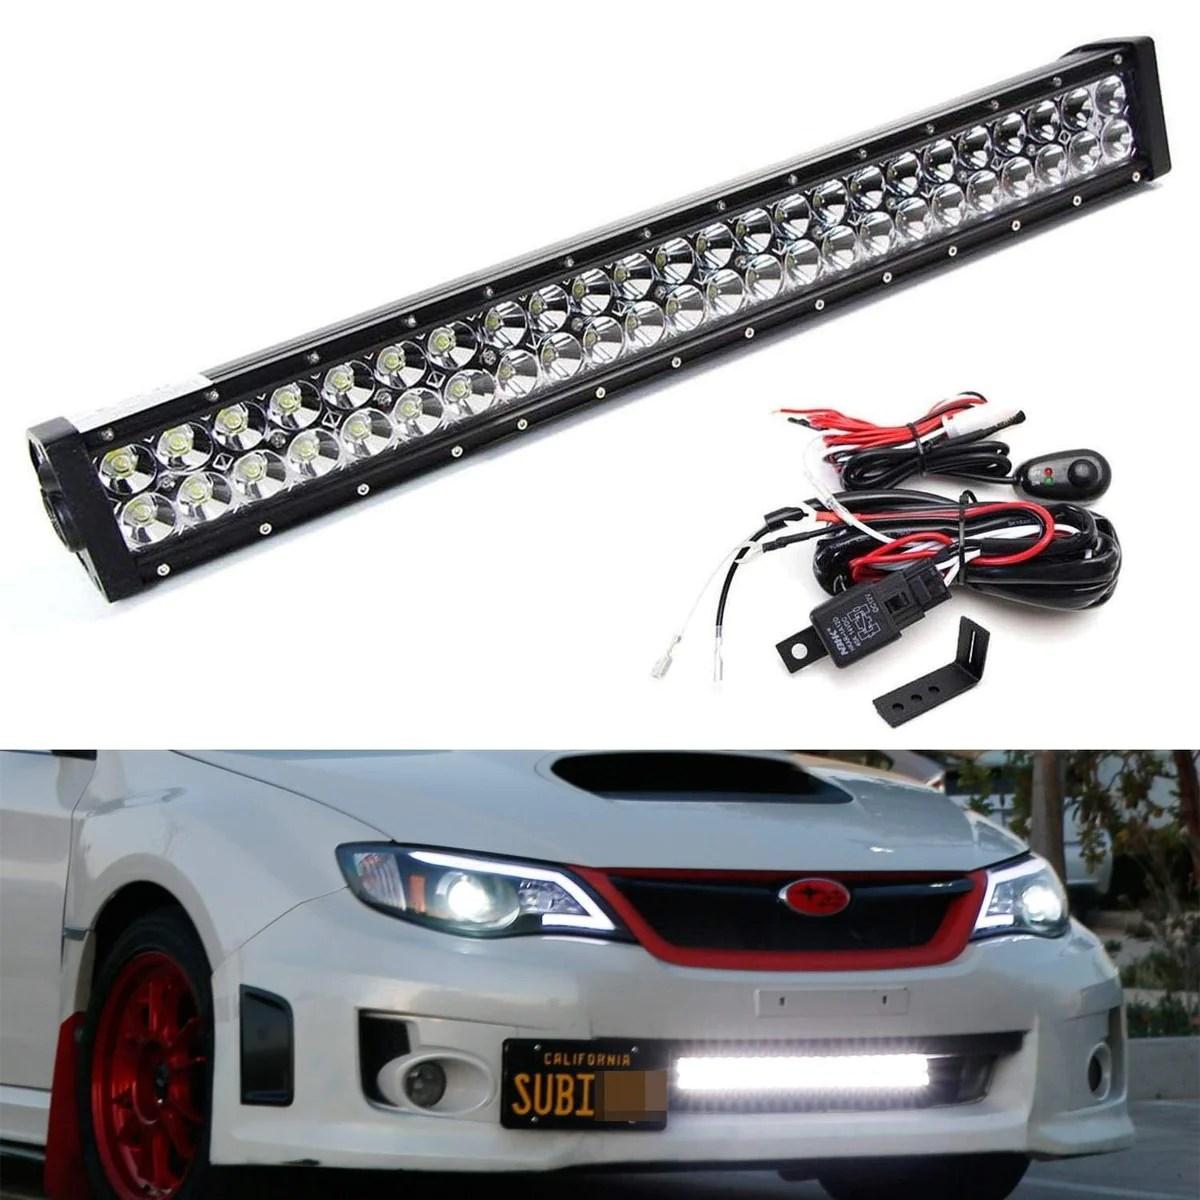 medium resolution of 11 14 subaru impreza wrx sti lower bumper led light bar kit ijdmtoy com